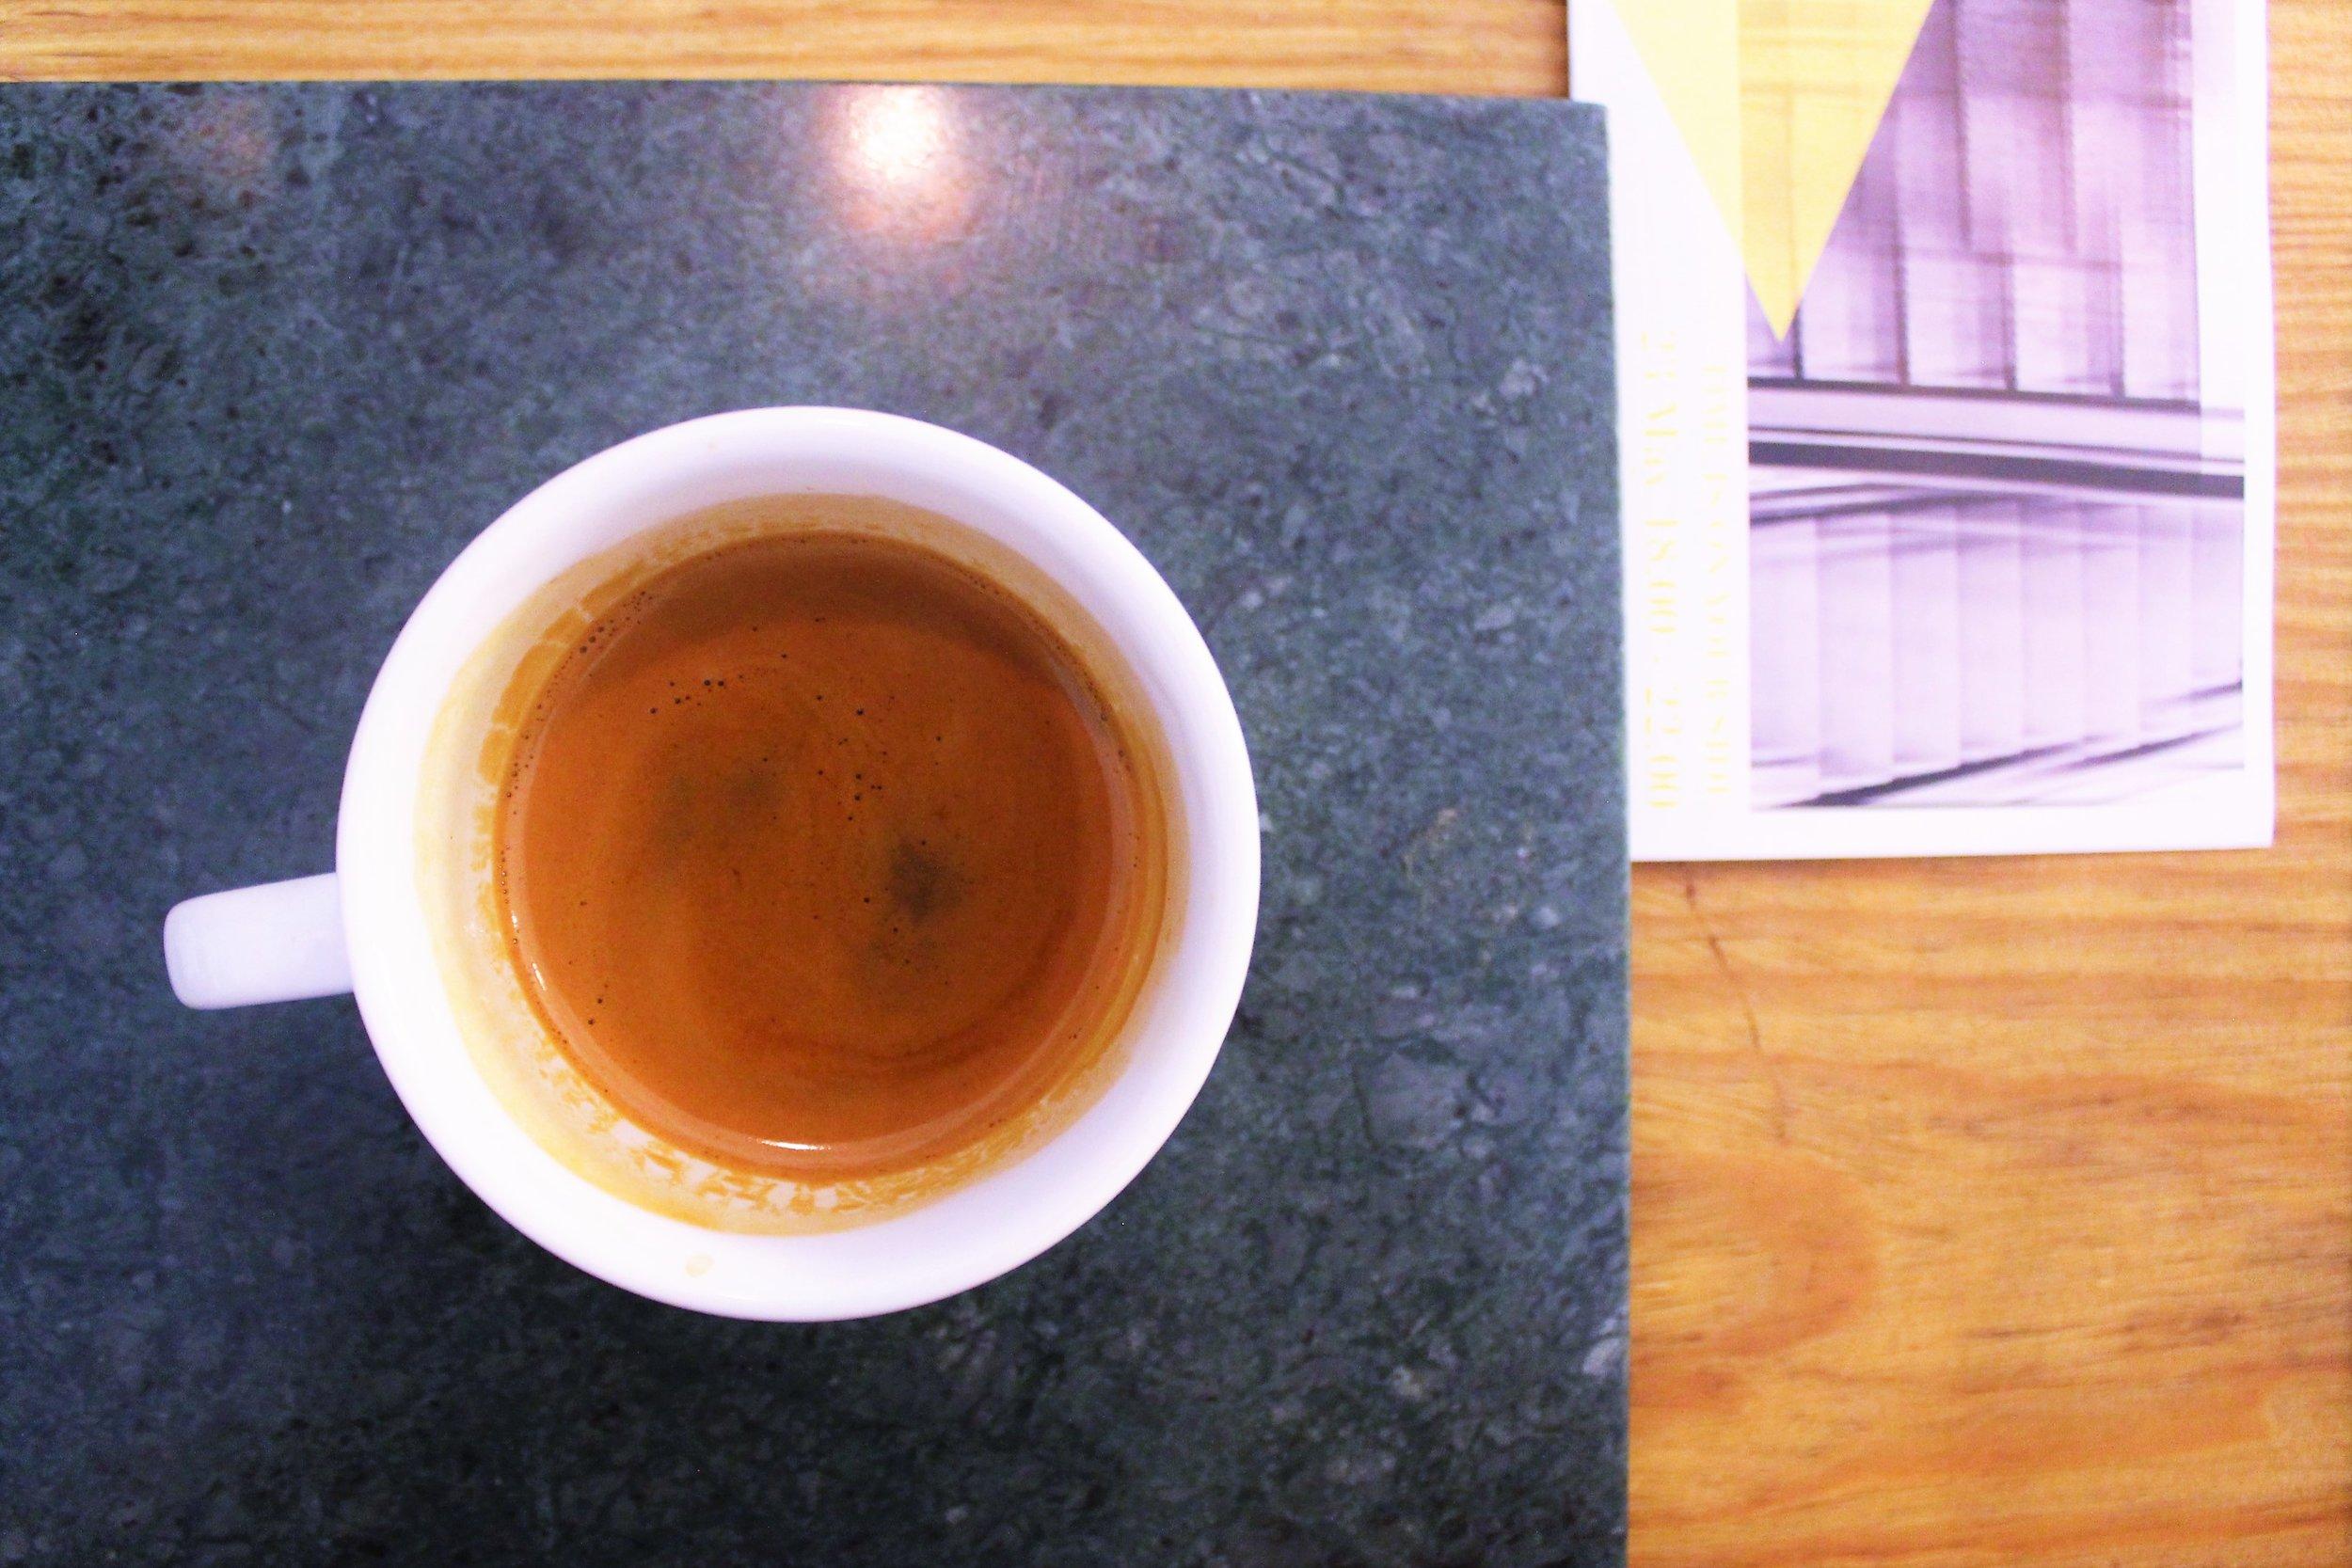 Guatemala Santa Barbara Espresso at Nømad Coffee in Barcelona